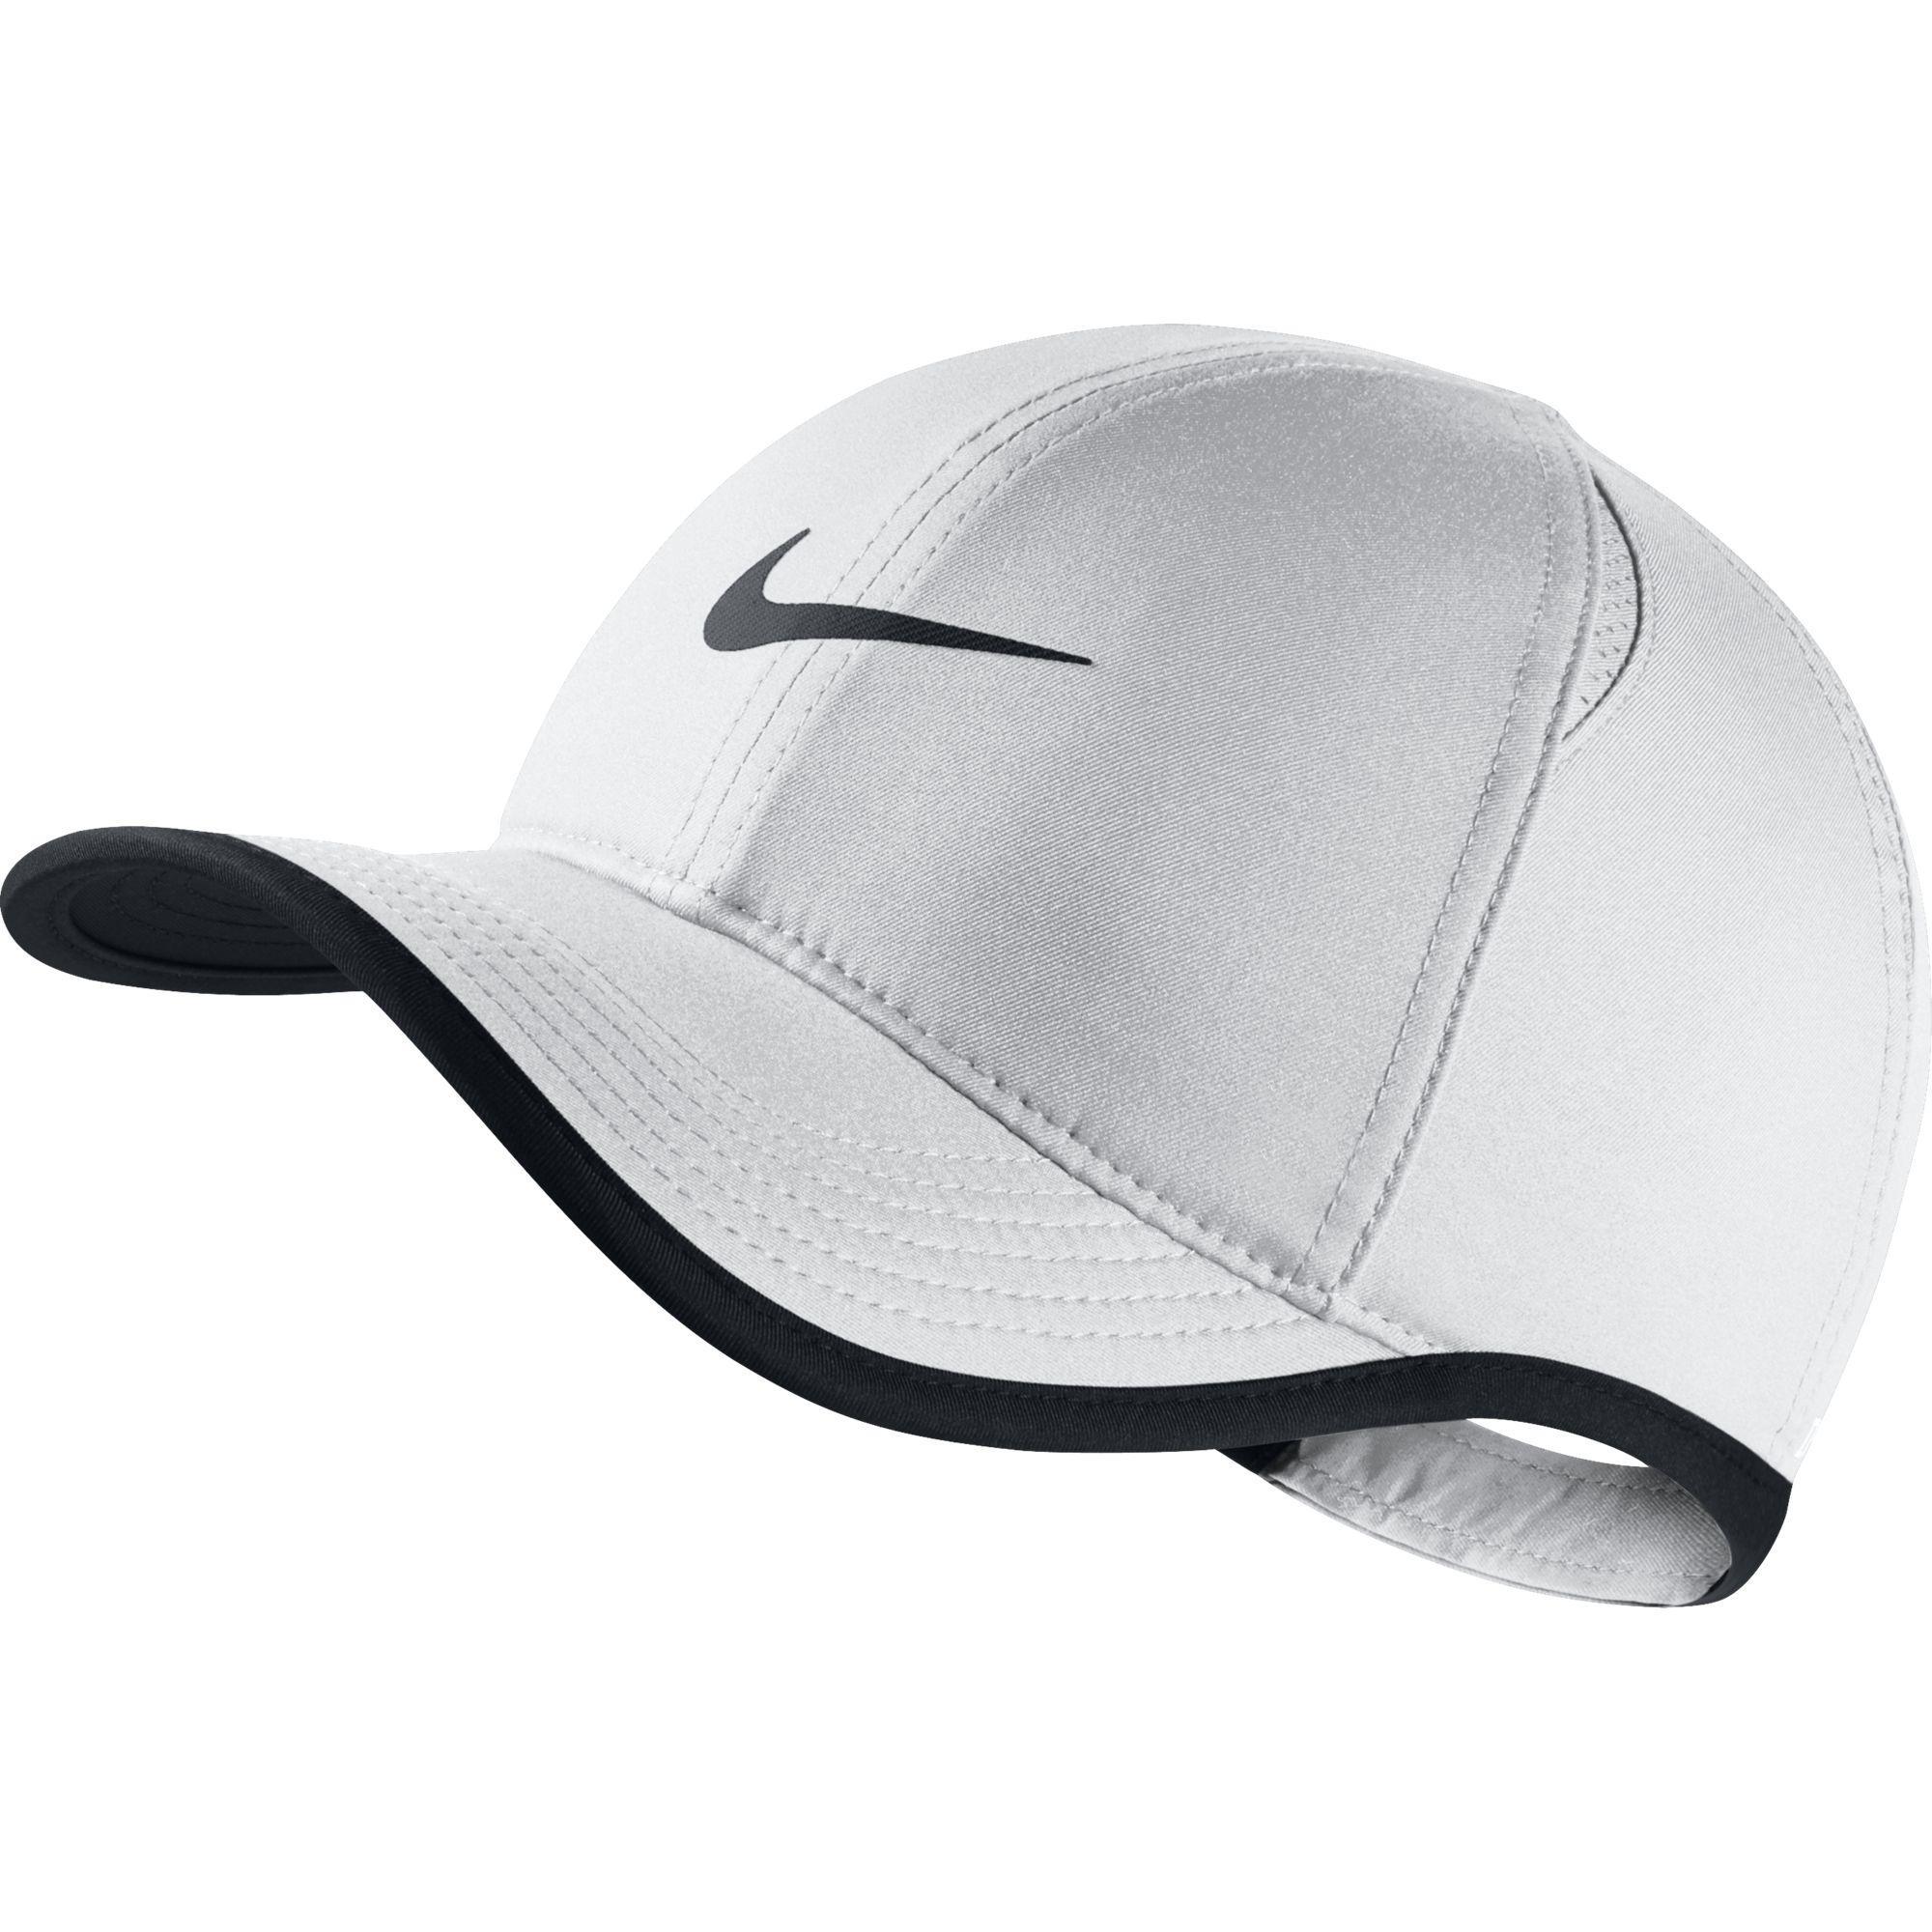 465603245e9 Nike Kids Featherlight Cap - White Black - Tennisnuts.com